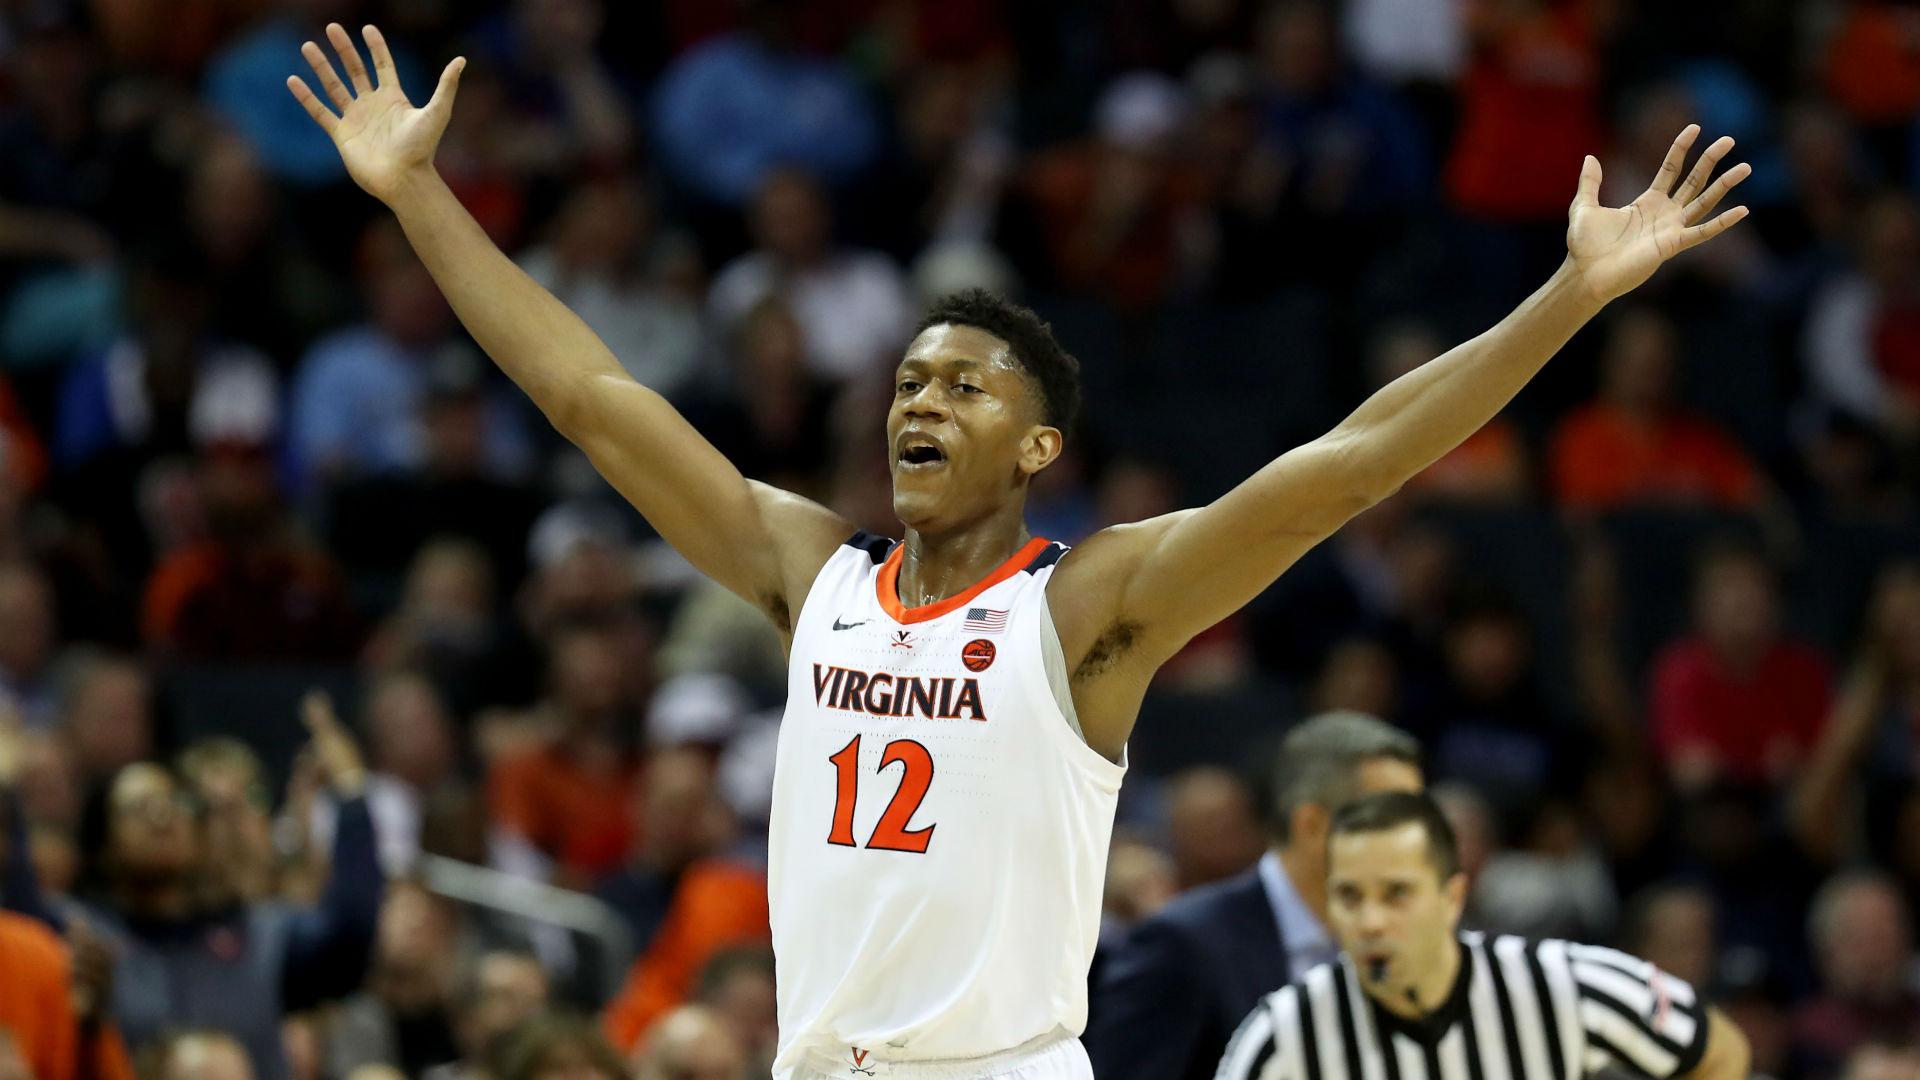 NBA Draft 2019: Virginia star De'Andre Hunter declares